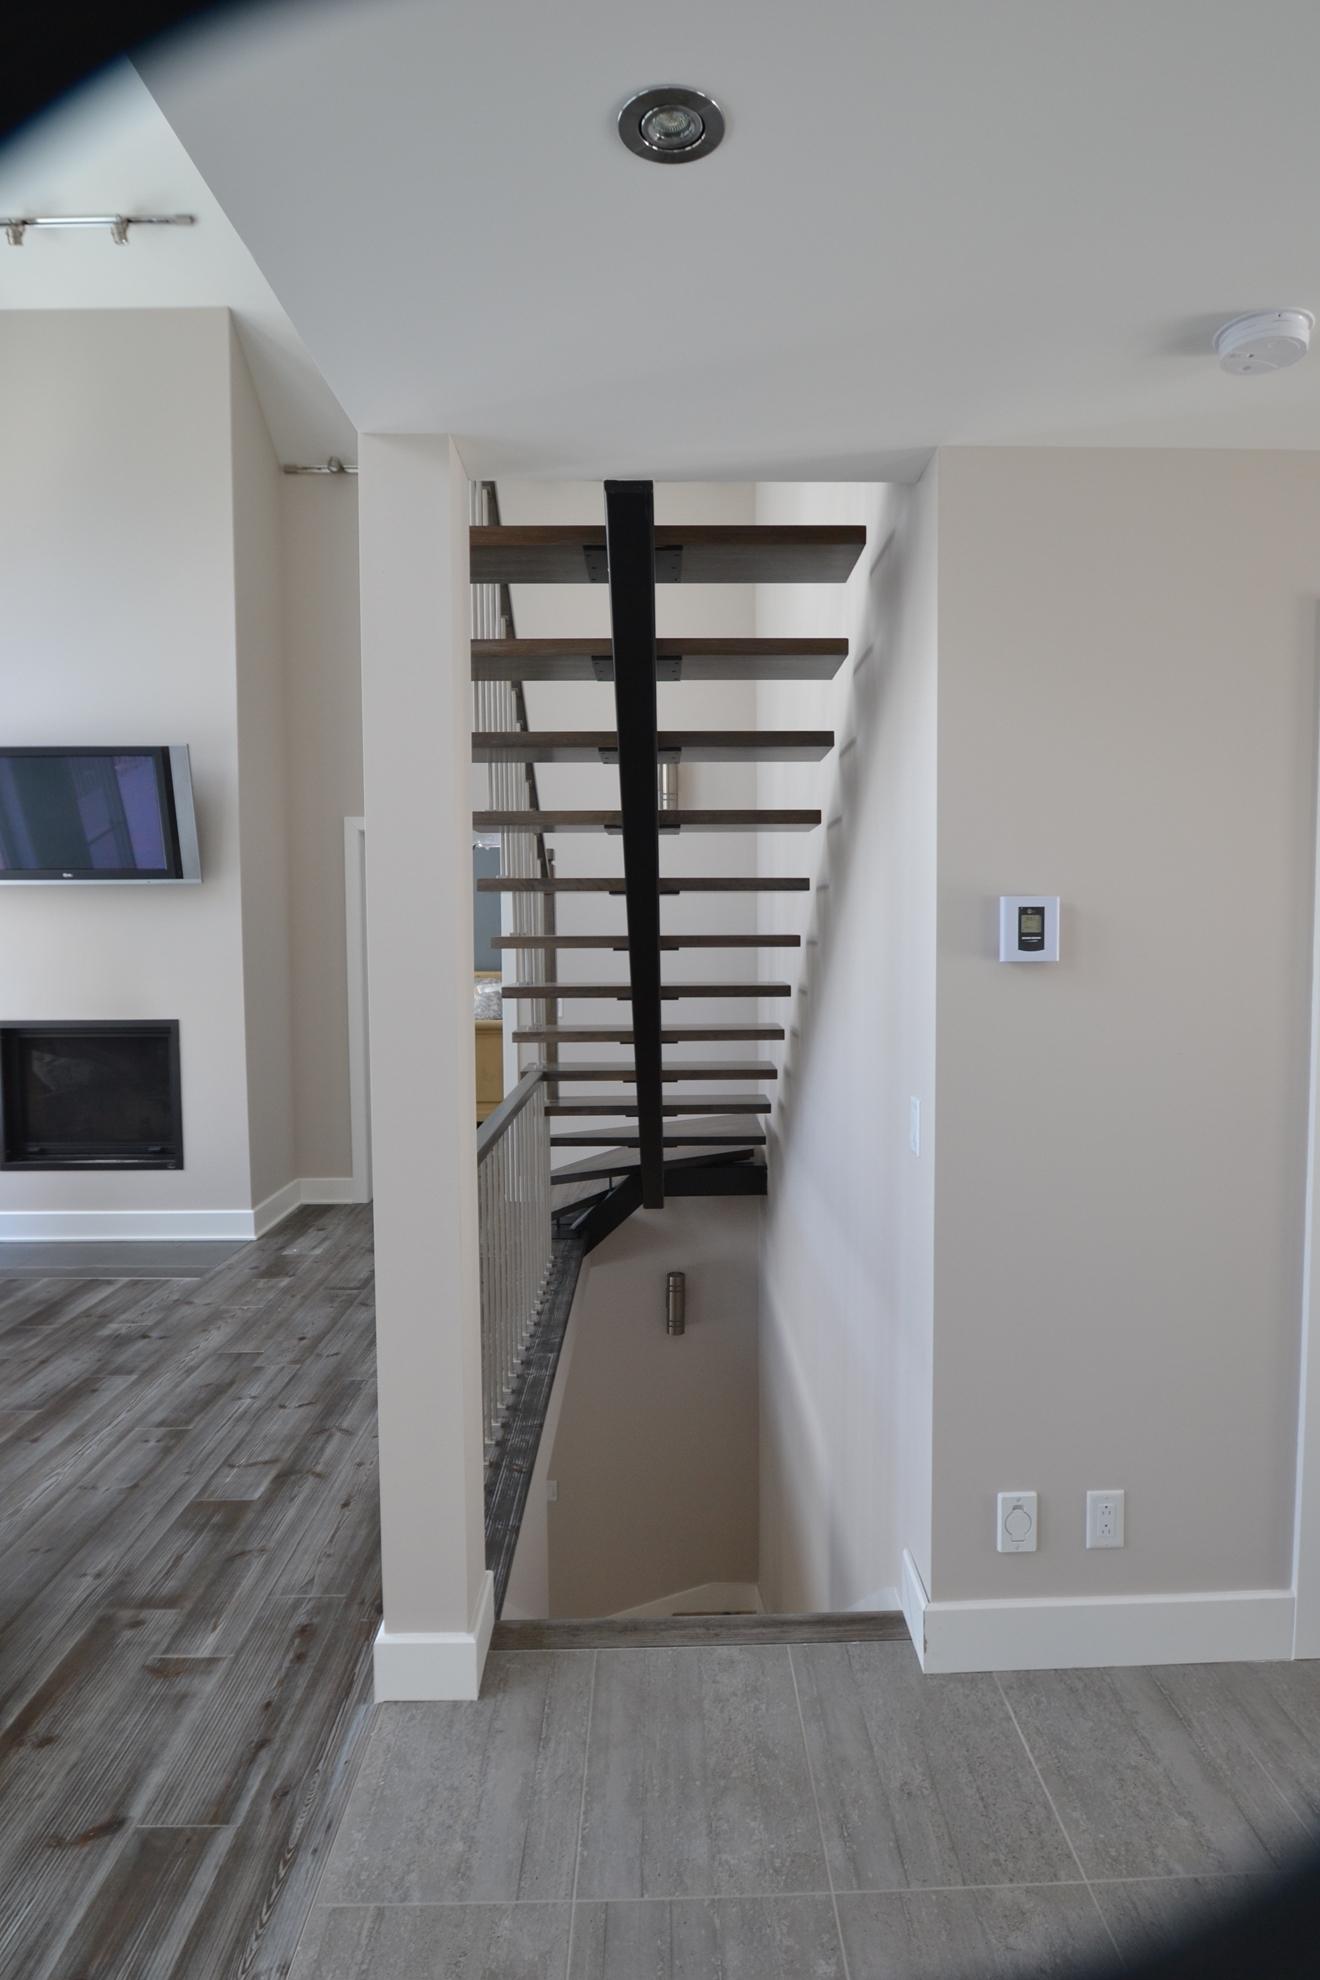 Picture of 09-Escalier limon central